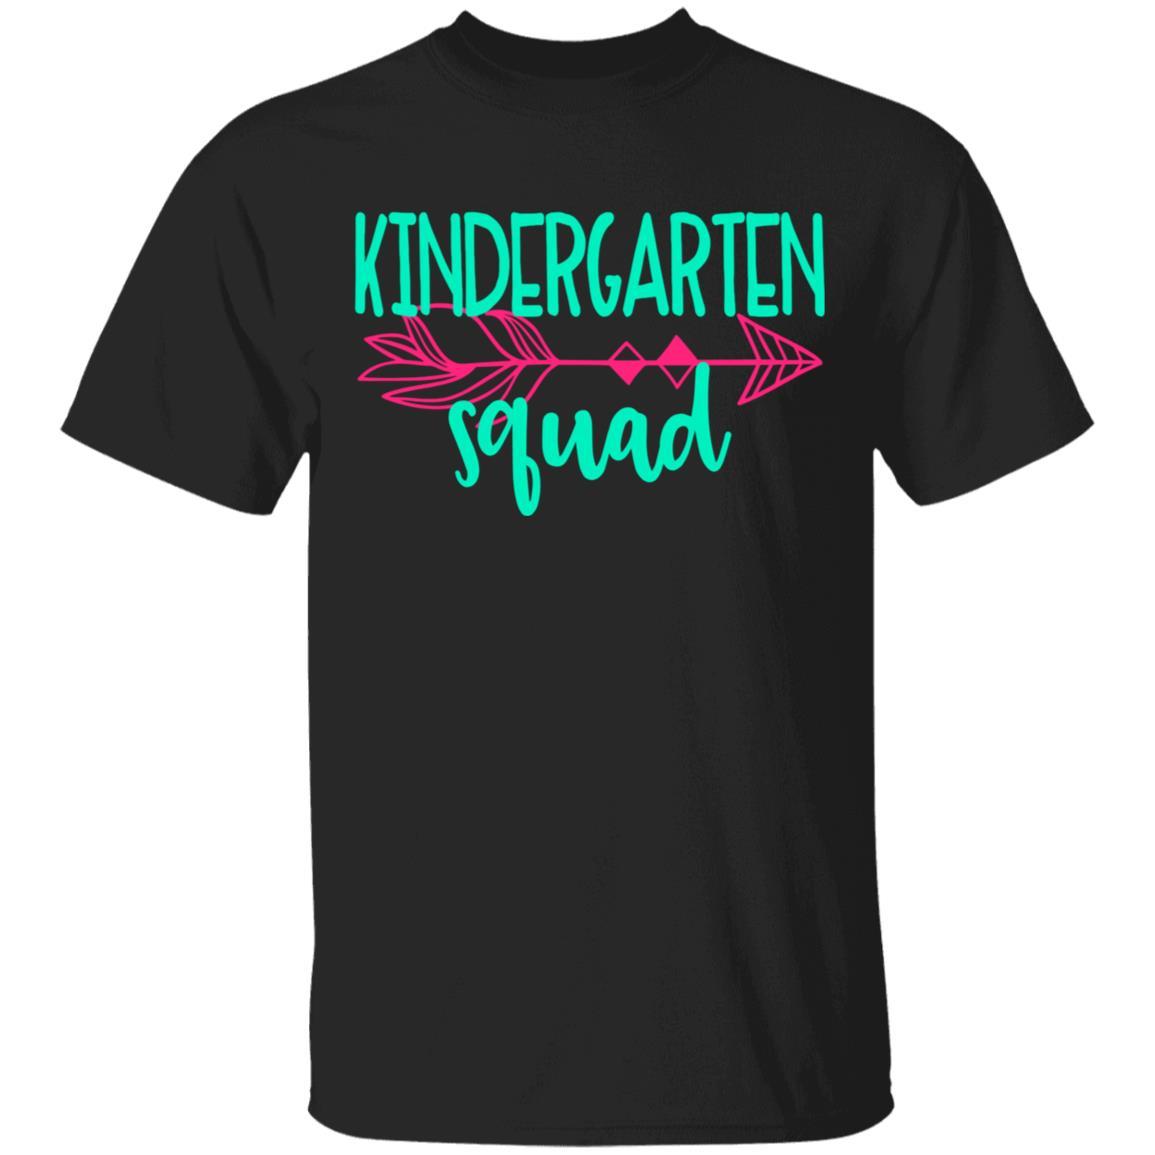 Kindergarten Squad (TeamGroup) Tee Teacher Unisex Short Sleeve